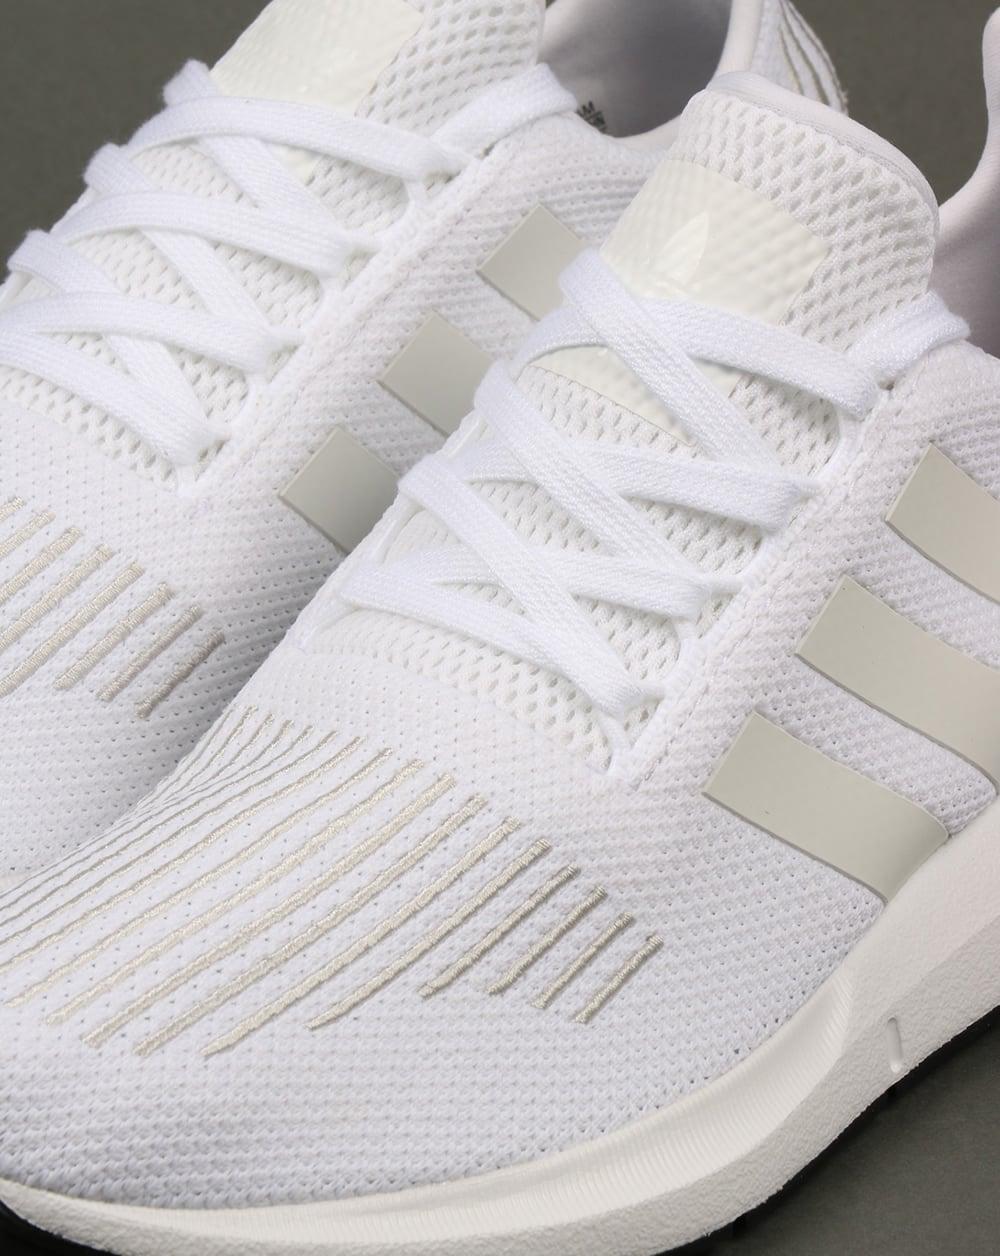 Adidas White Swift Run Trainers - Ecosia a577104ef